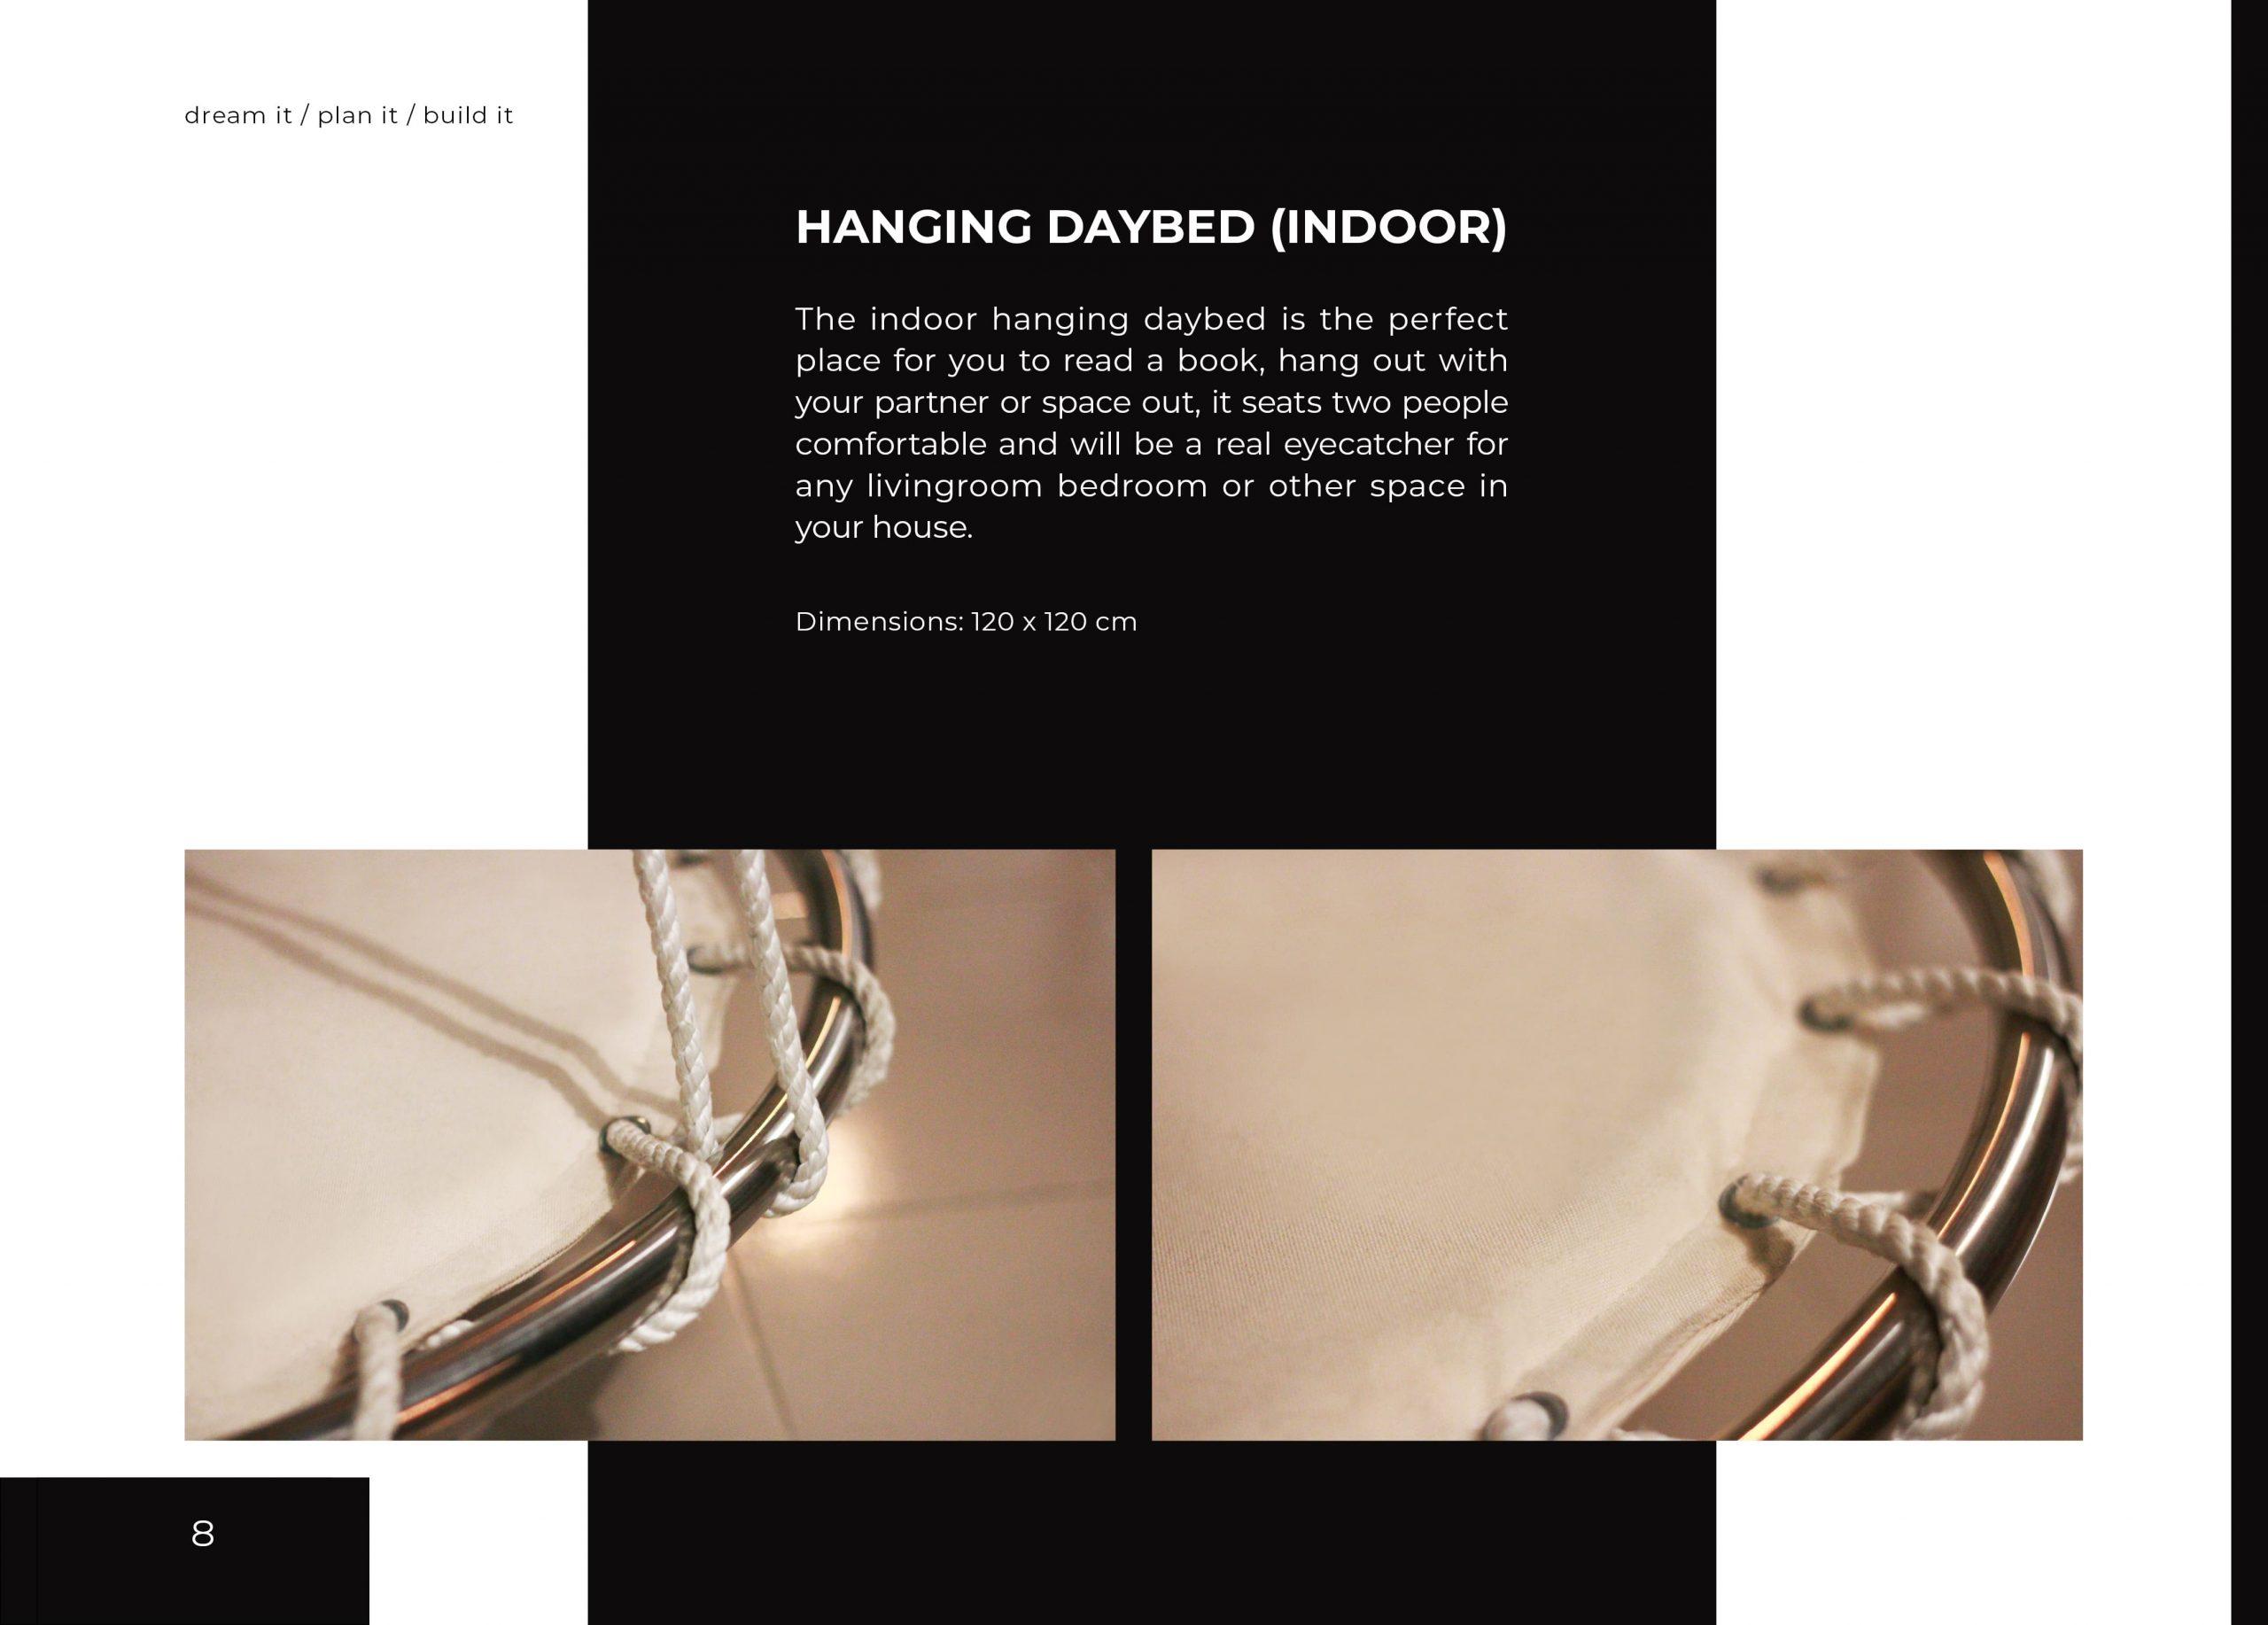 FabsFurniture Taiwan Portfolio - 2021 - hanging daybed - indoor